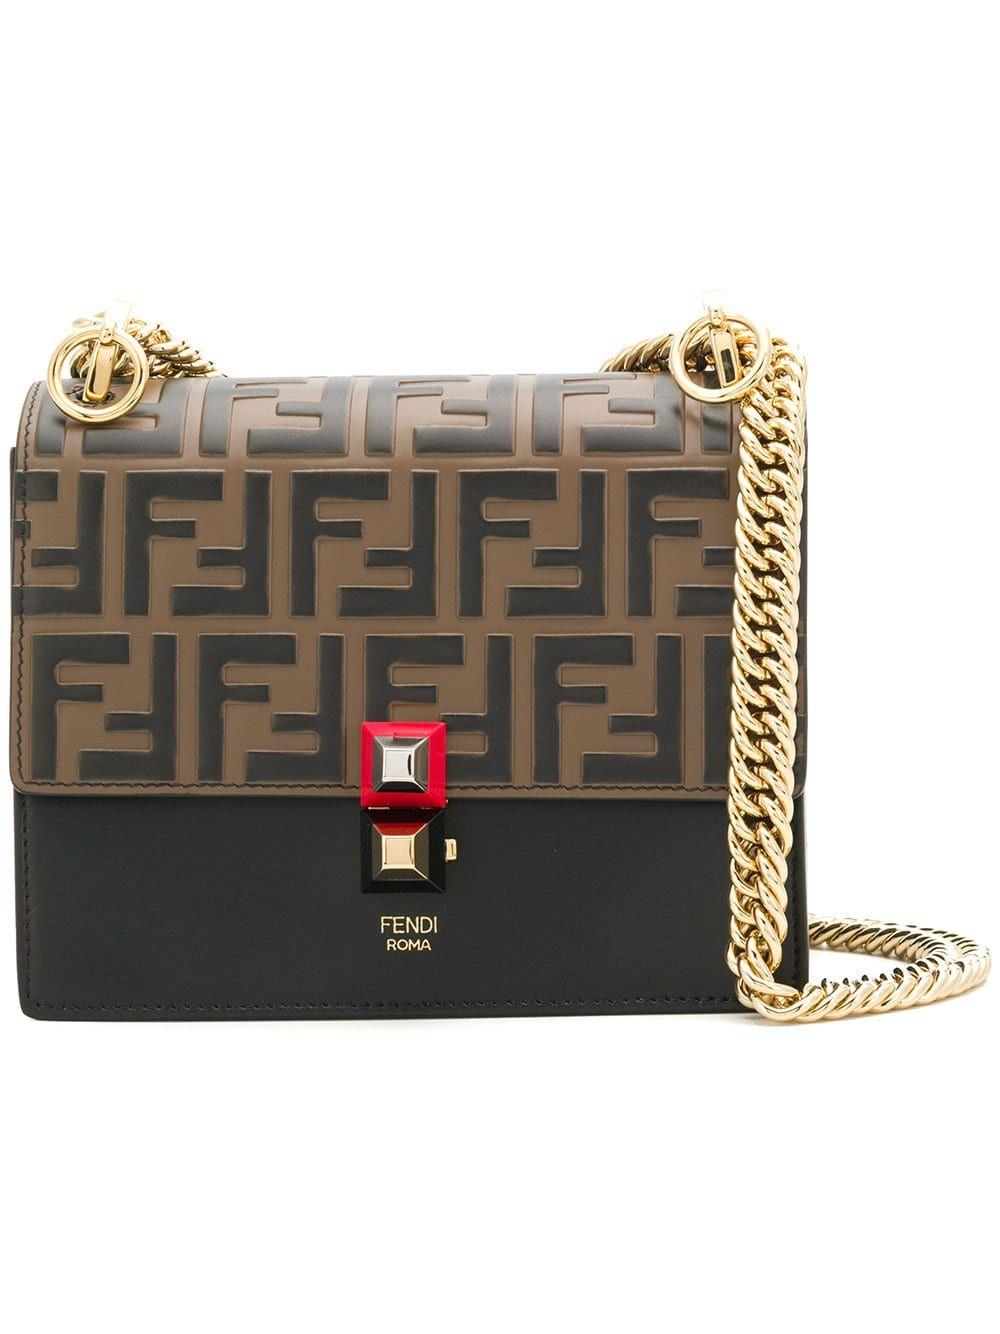 fendi #bags #kani #gold #chain #shoulderbag #clutch #new